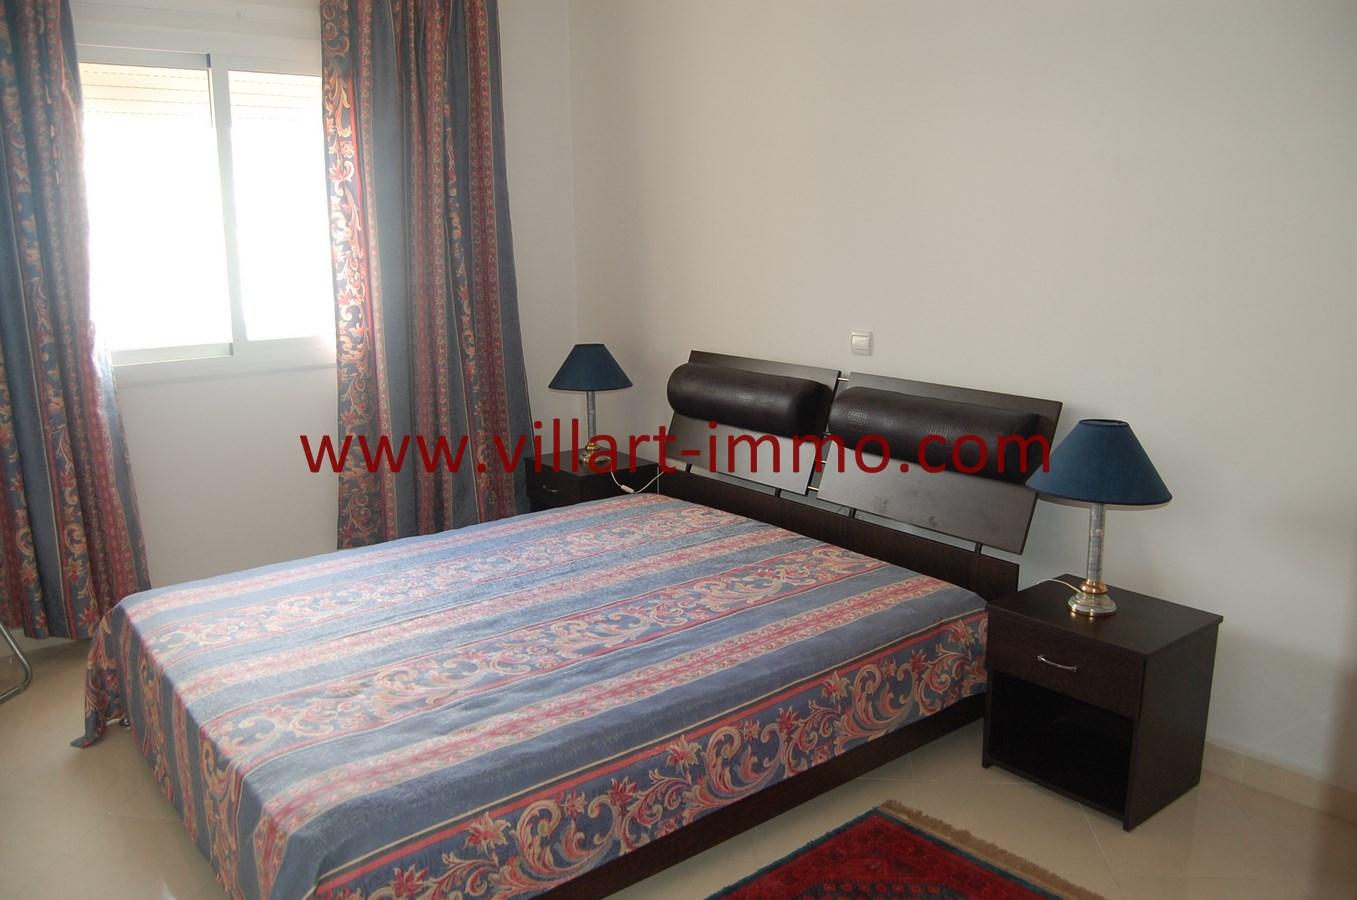 11-Vente-Appartement-Tanger-Route de Rabat-Chambre 2-VA494-Villart Immo